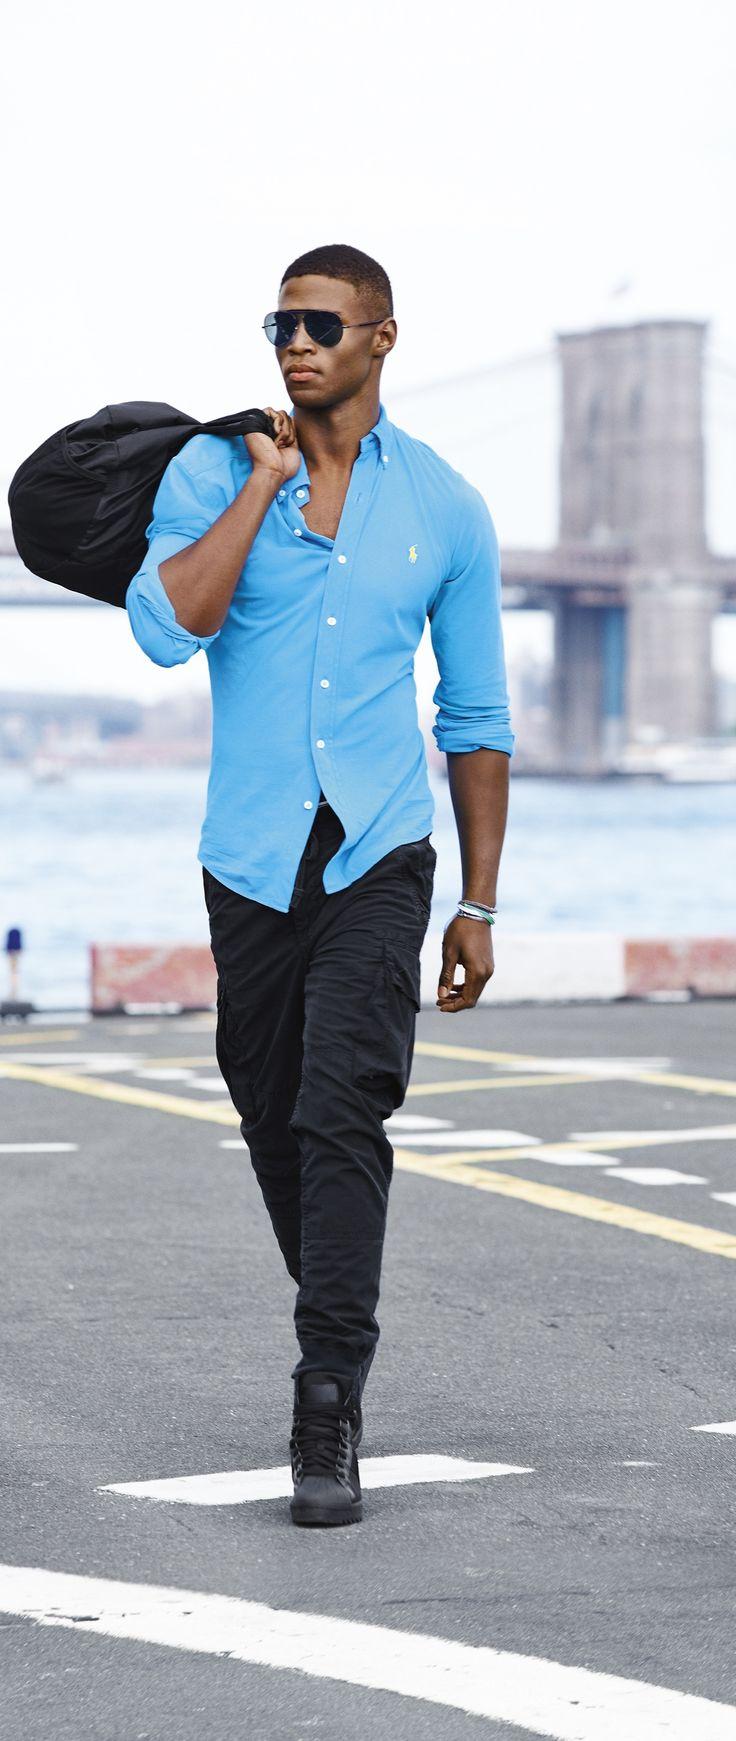 New arrivals from Polo Ralph Lauren: the quintessential blue sport shirt gets a luxe update